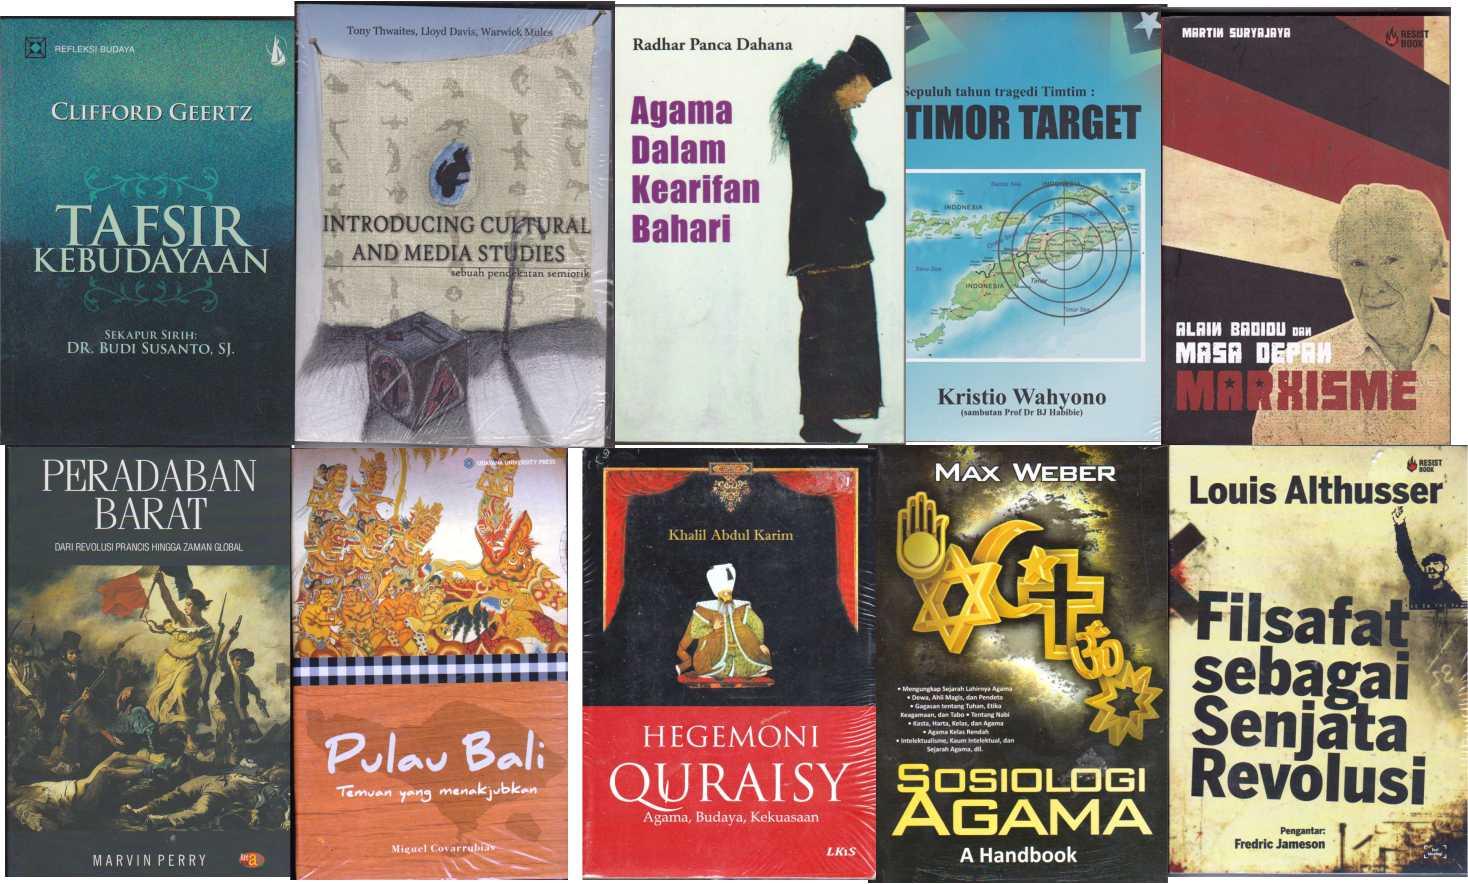 Jualan Buku Sastra Katalog Sastra Nonsastra November 2015